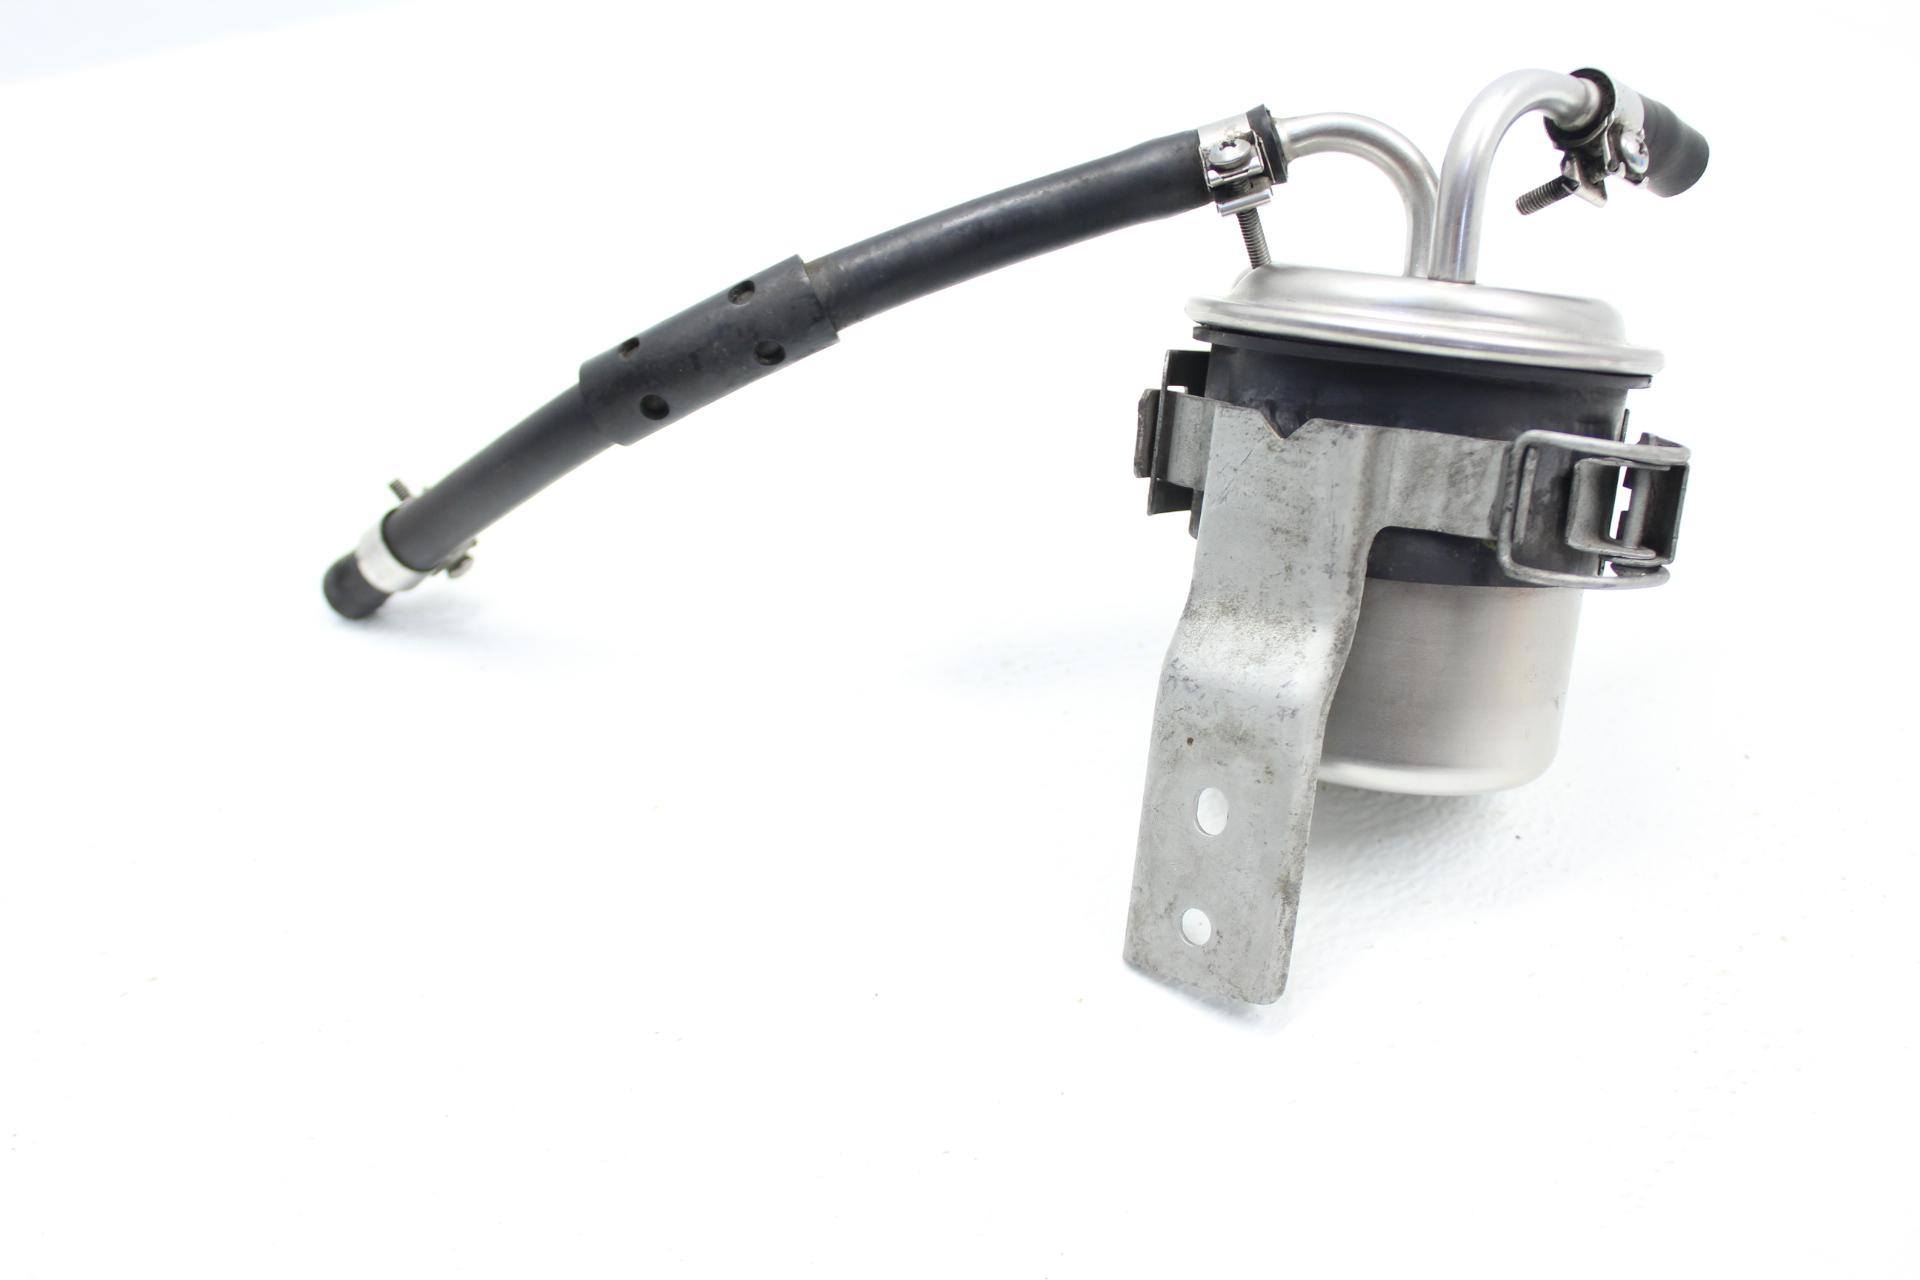 hight resolution of 2002 2005 subaru impreza wrx fuel filter retainer holder oem factory 02 05